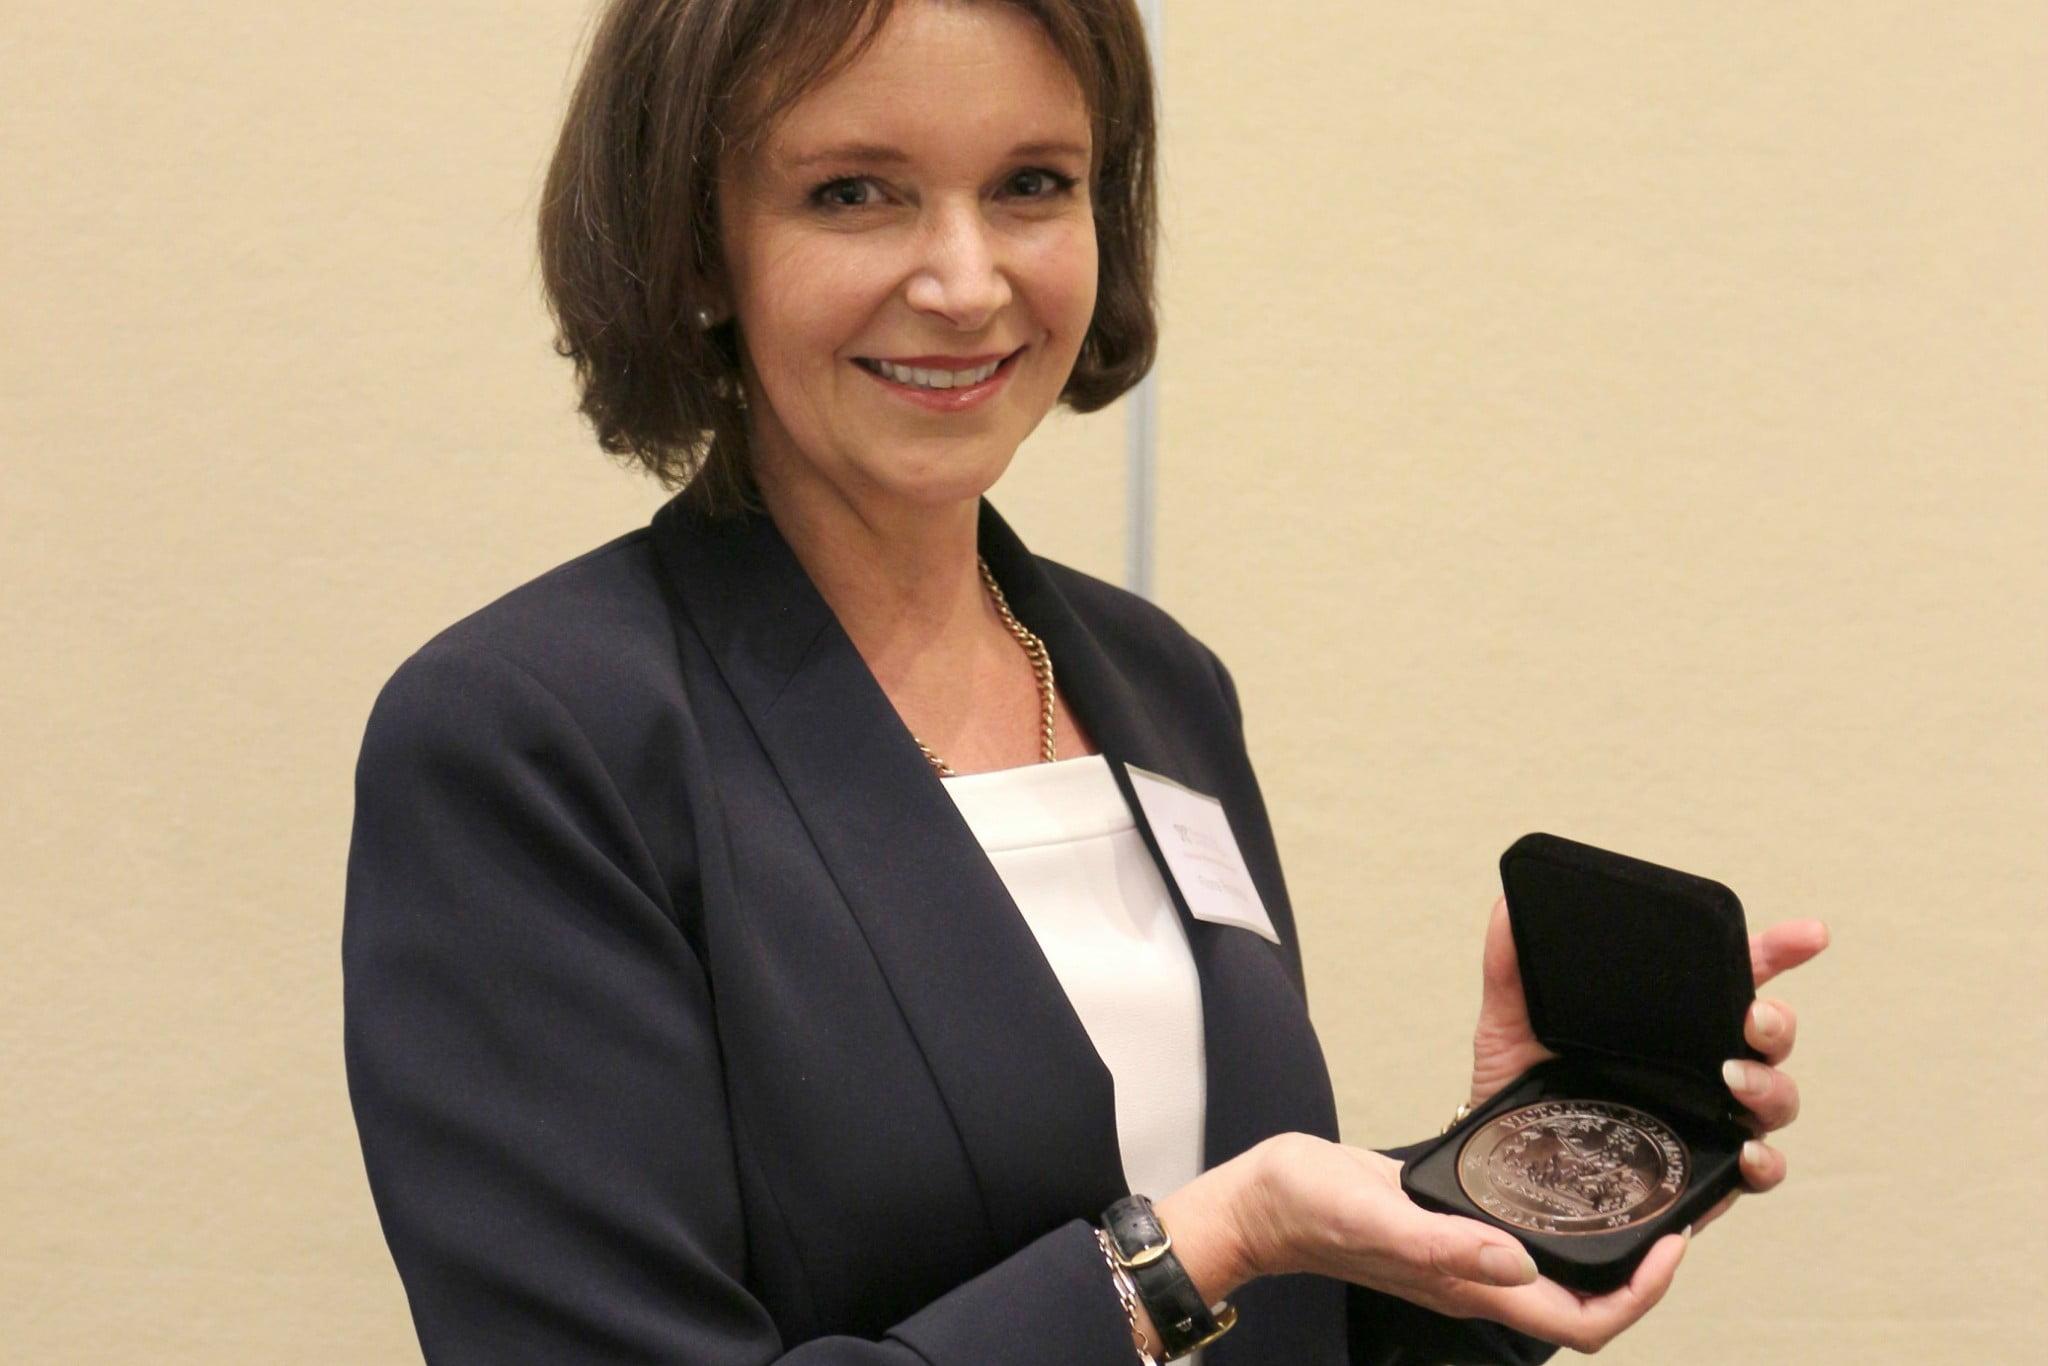 Fiona Robertson with award